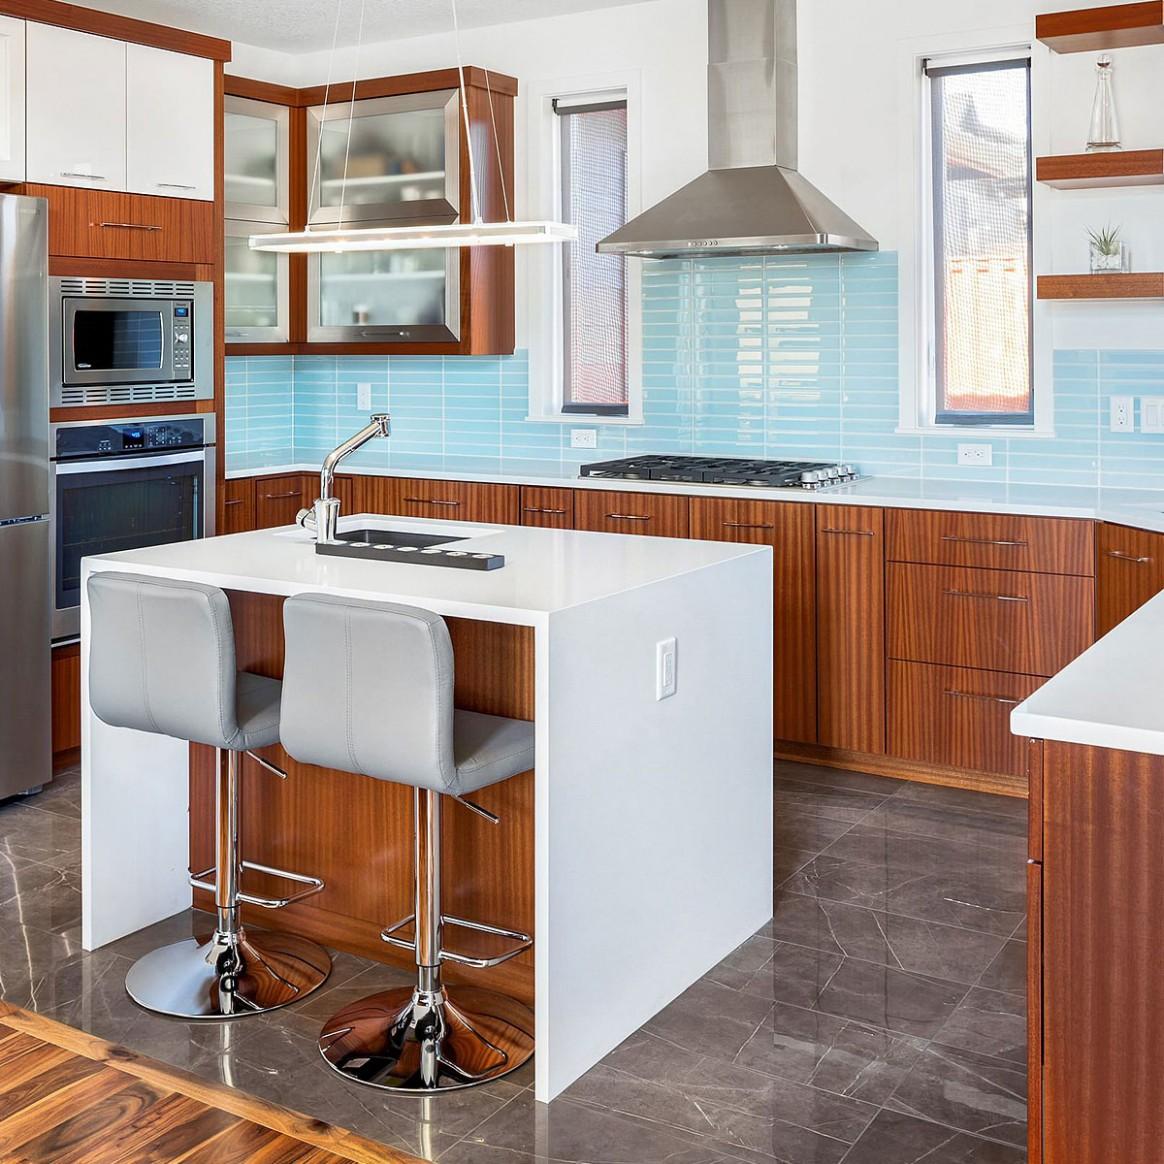 11+ Blue Backsplash Ideas ( Navy, Aqua, Royal or Coastal ) Blue Design - Kitchen Backsplash With Light Wood Cabinets